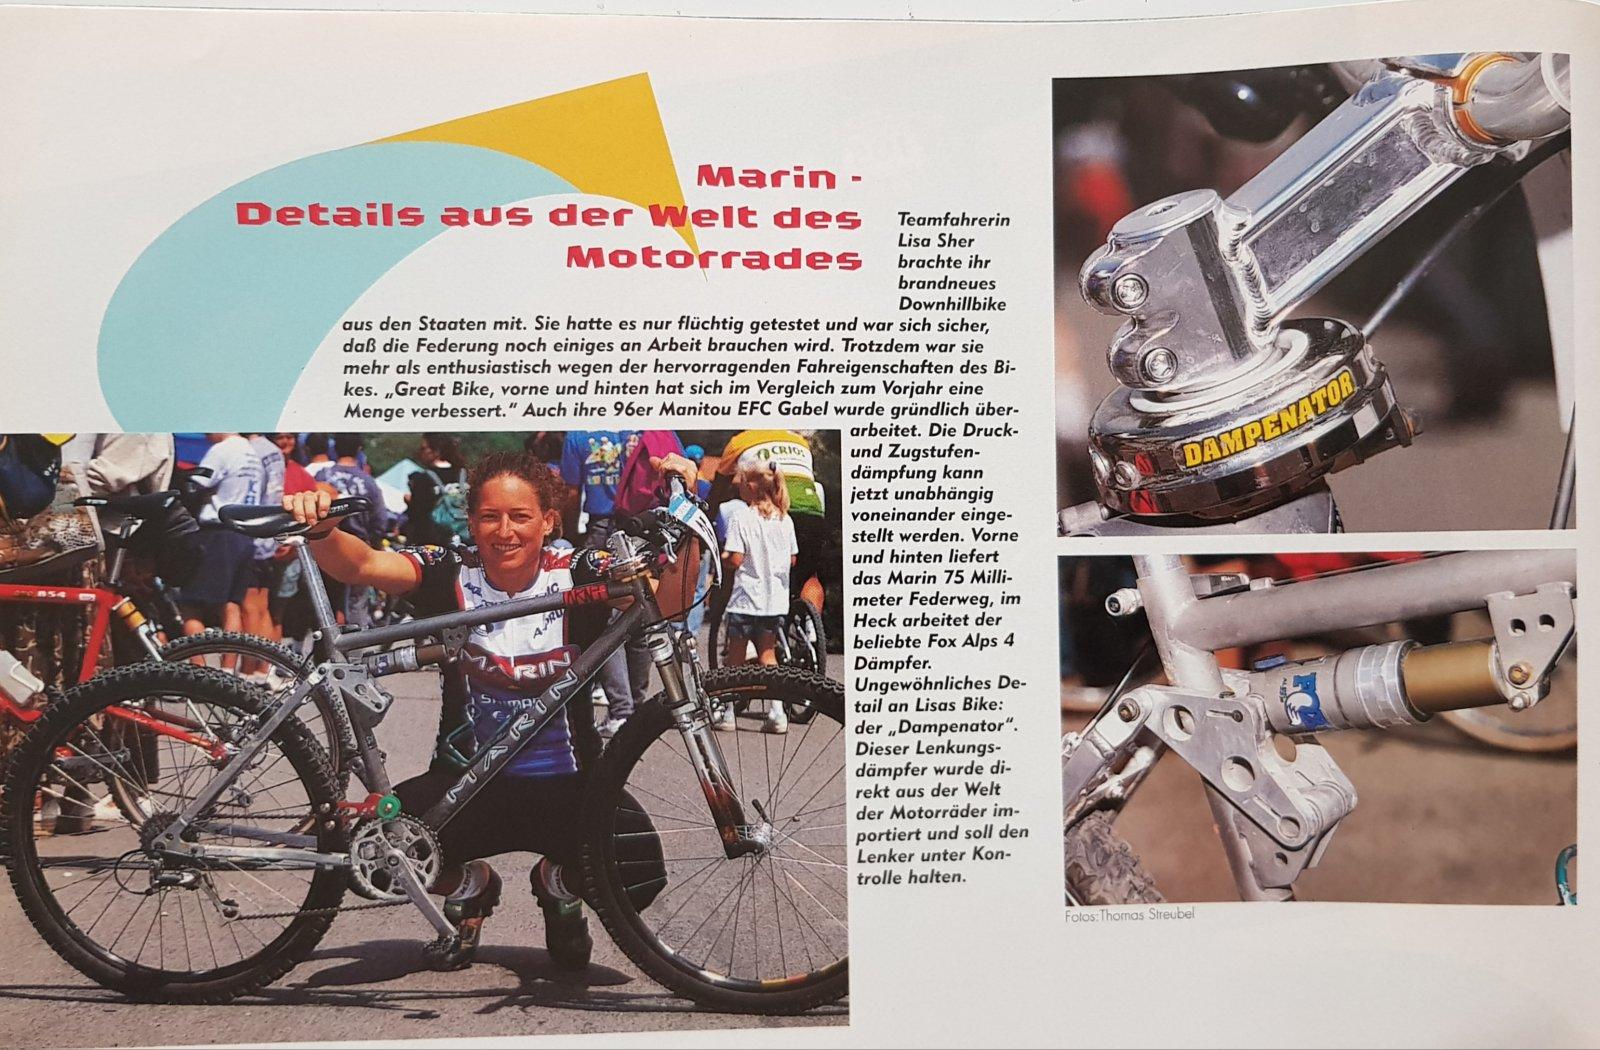 Marin FS Team DH Bike Lisa Sher aus Bike 1995_07.jpg